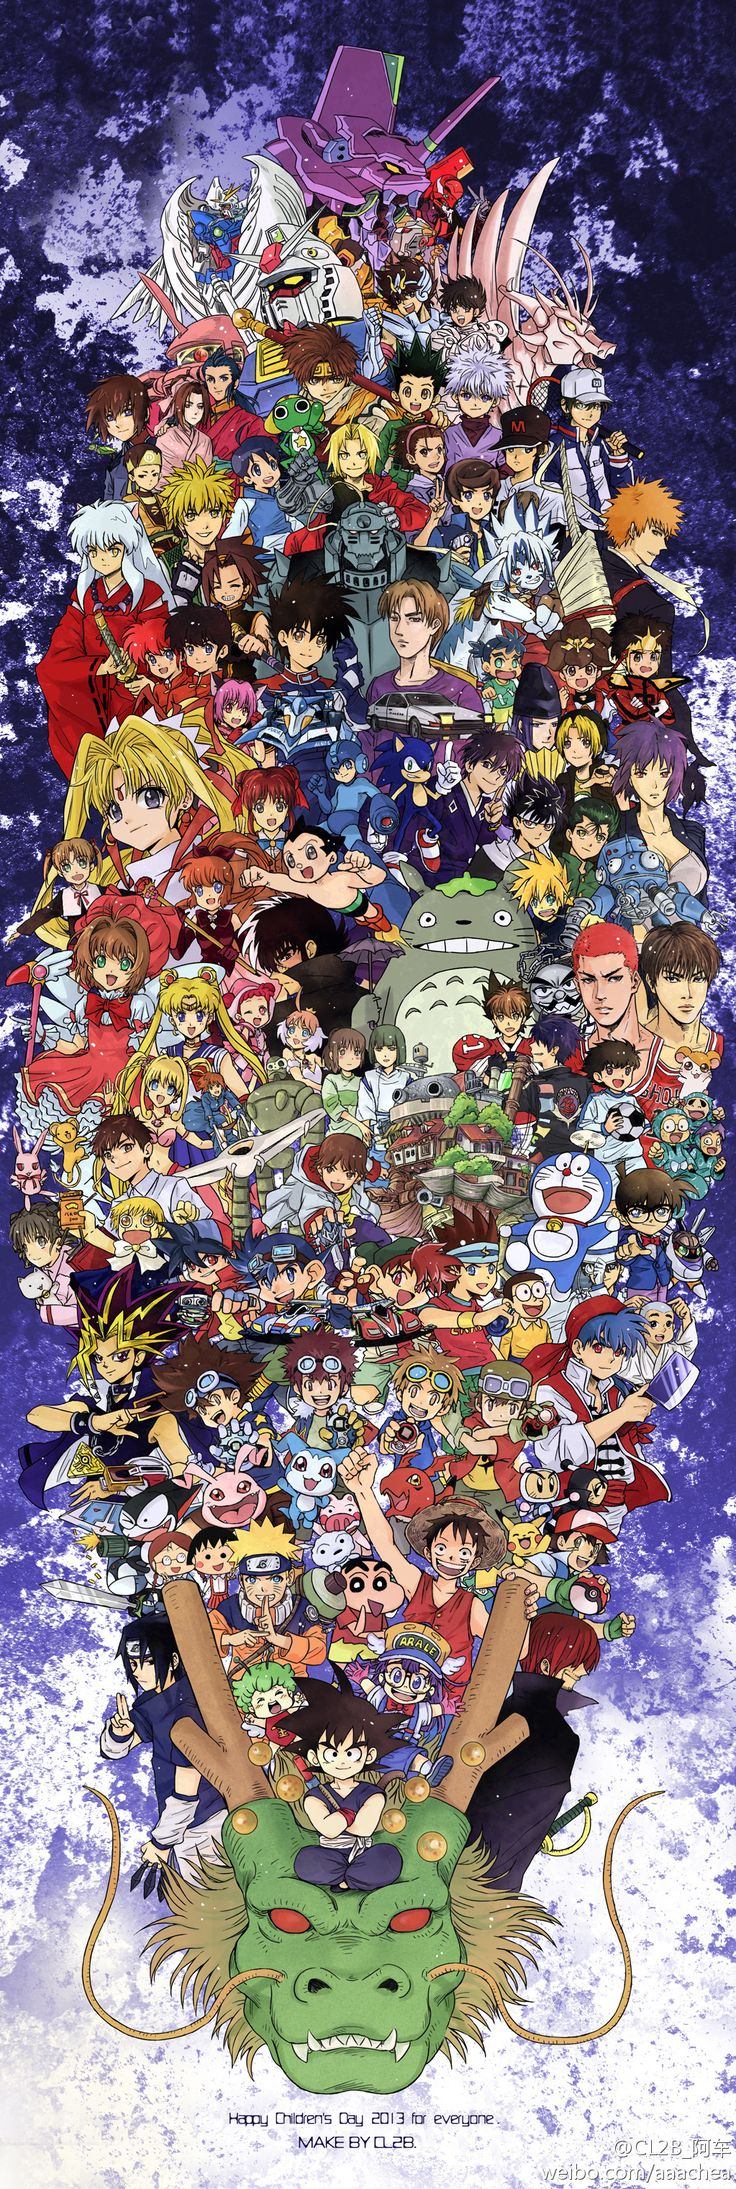 Cross-Over- Zerochan | anime | air gear, astro boy, beyblade, sailor moon, black jack, shin chan, digimon, detective conan, doraemon, dr. slump, dragon ball, fullmetal alchemist, getbackers, hamtaro, inuyasha, one piece, prince of tennis, princess tutu, ranma, yu gi oh, slam dunk, totoro, naruto, bleach, spirited away, pokemon mega man